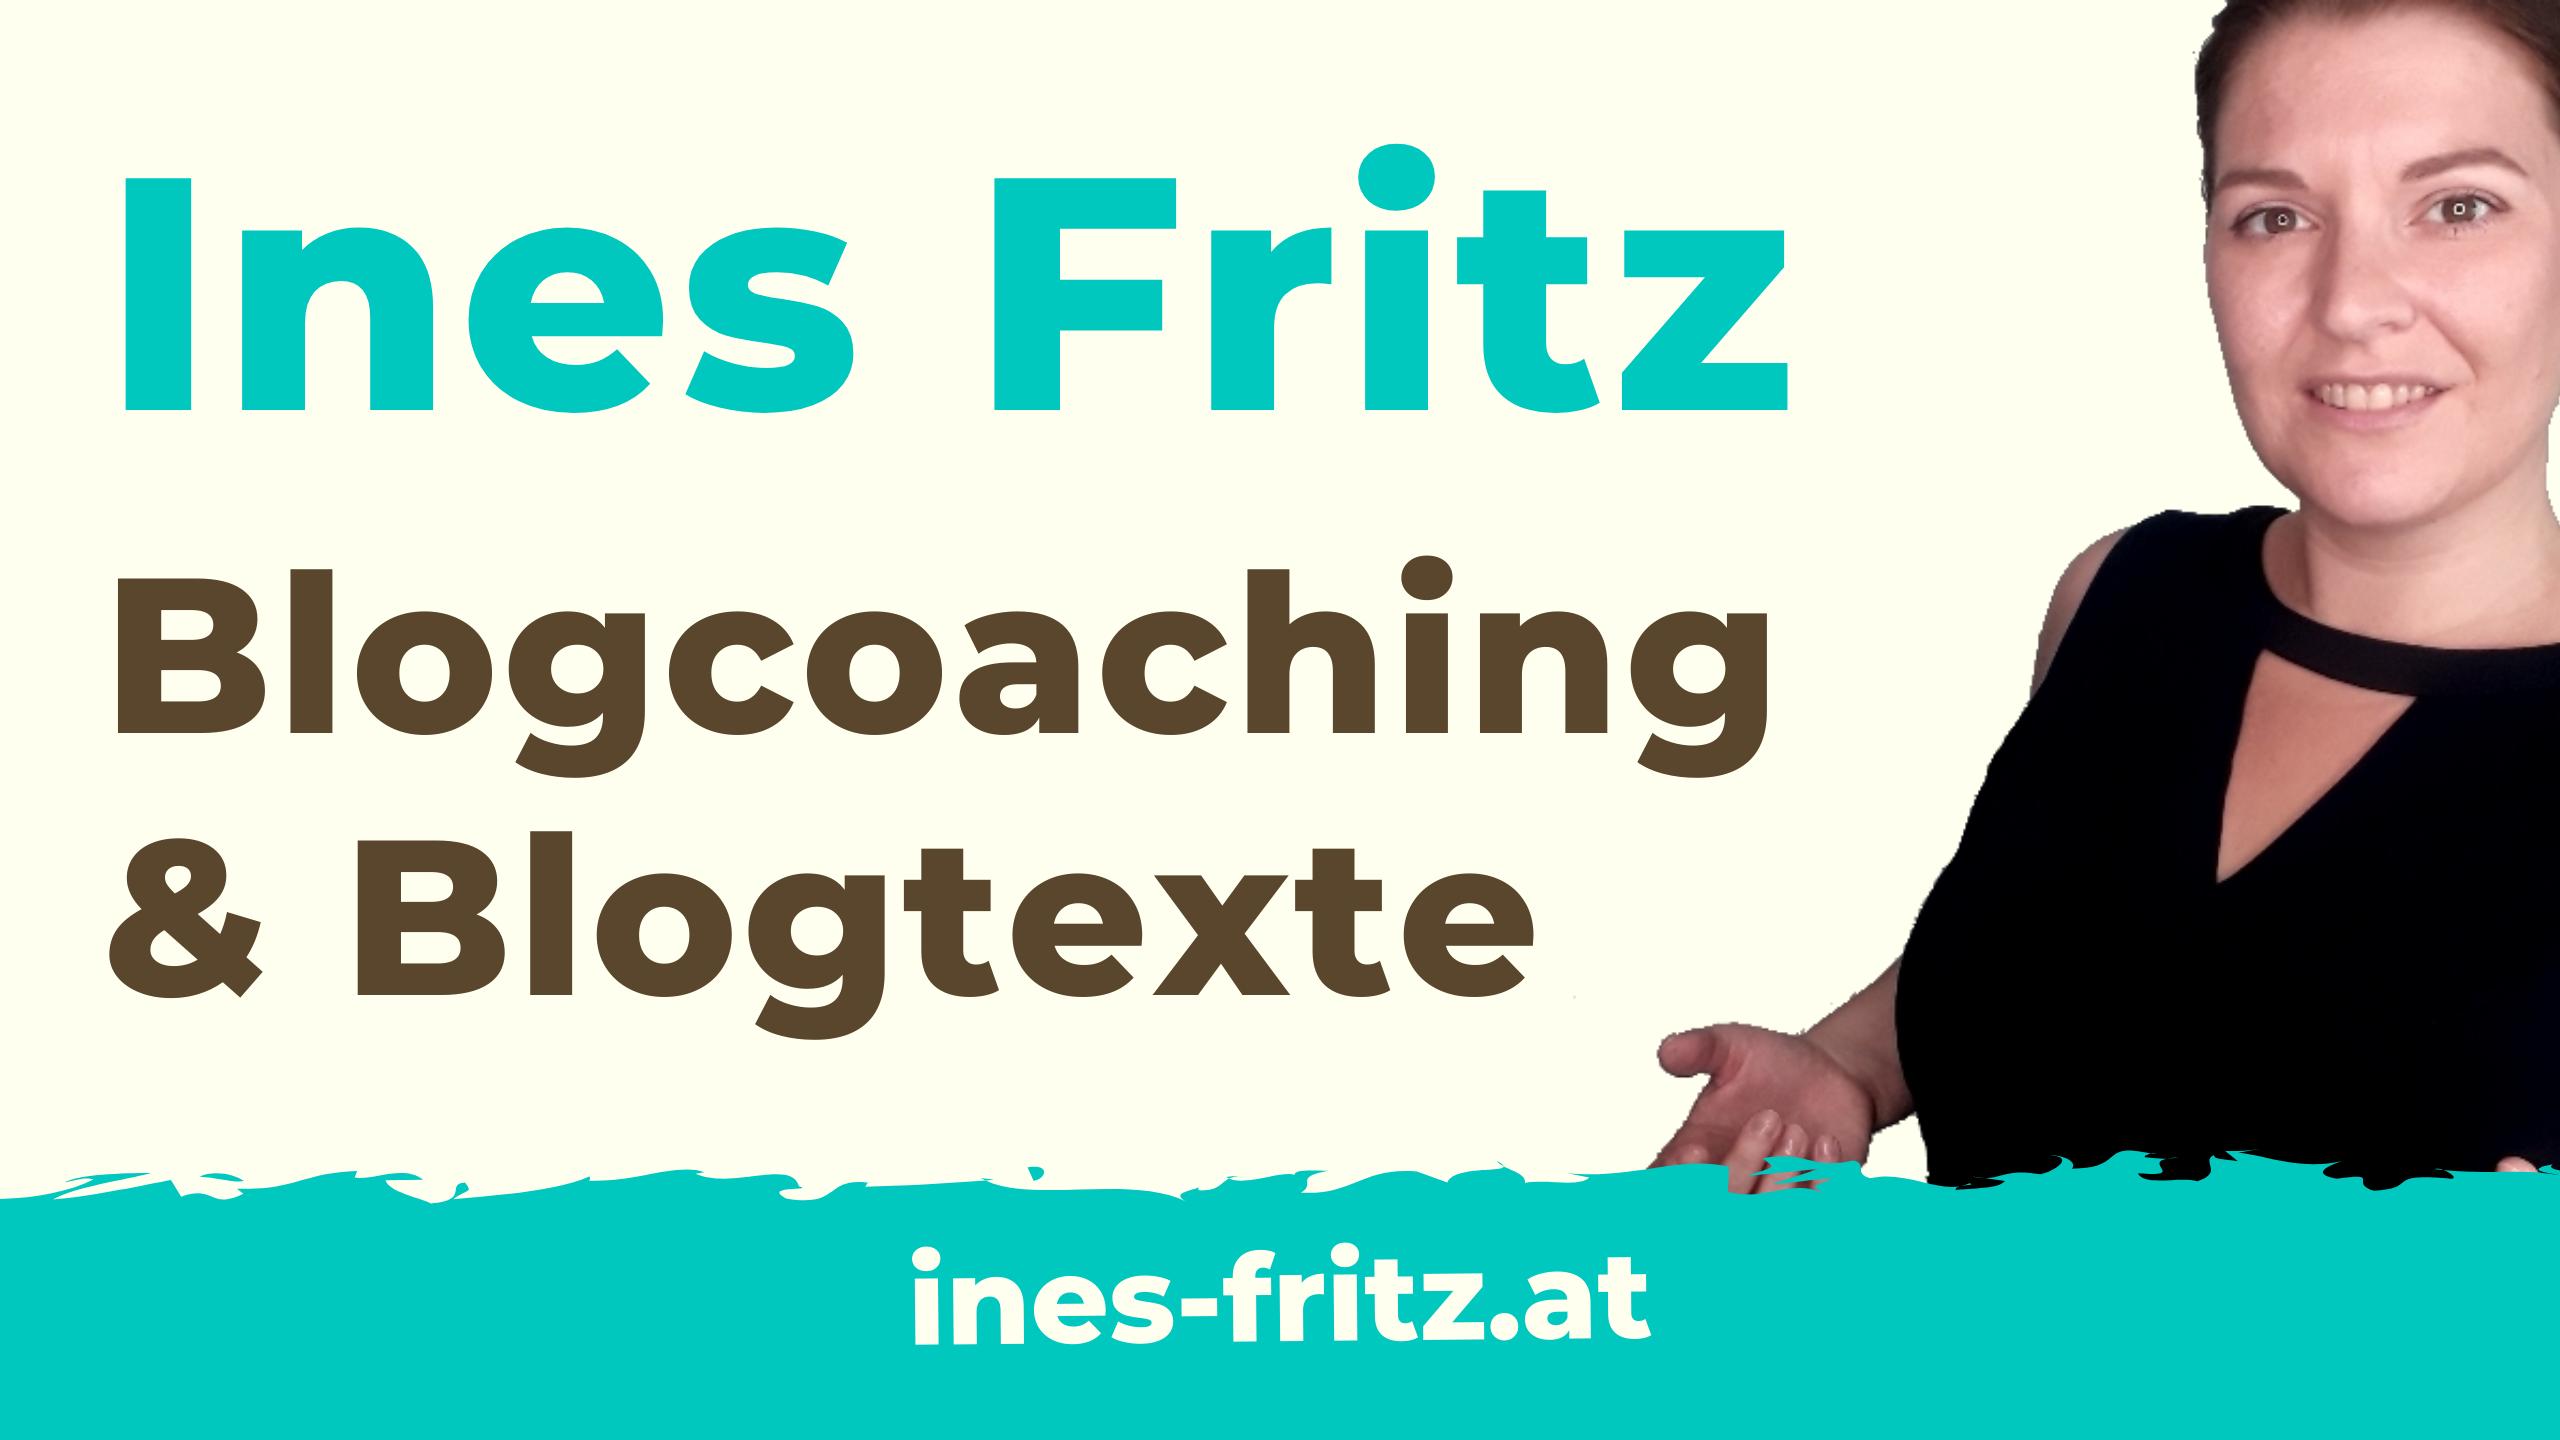 Ines Fritz - Blogcoaching & Blogtexte